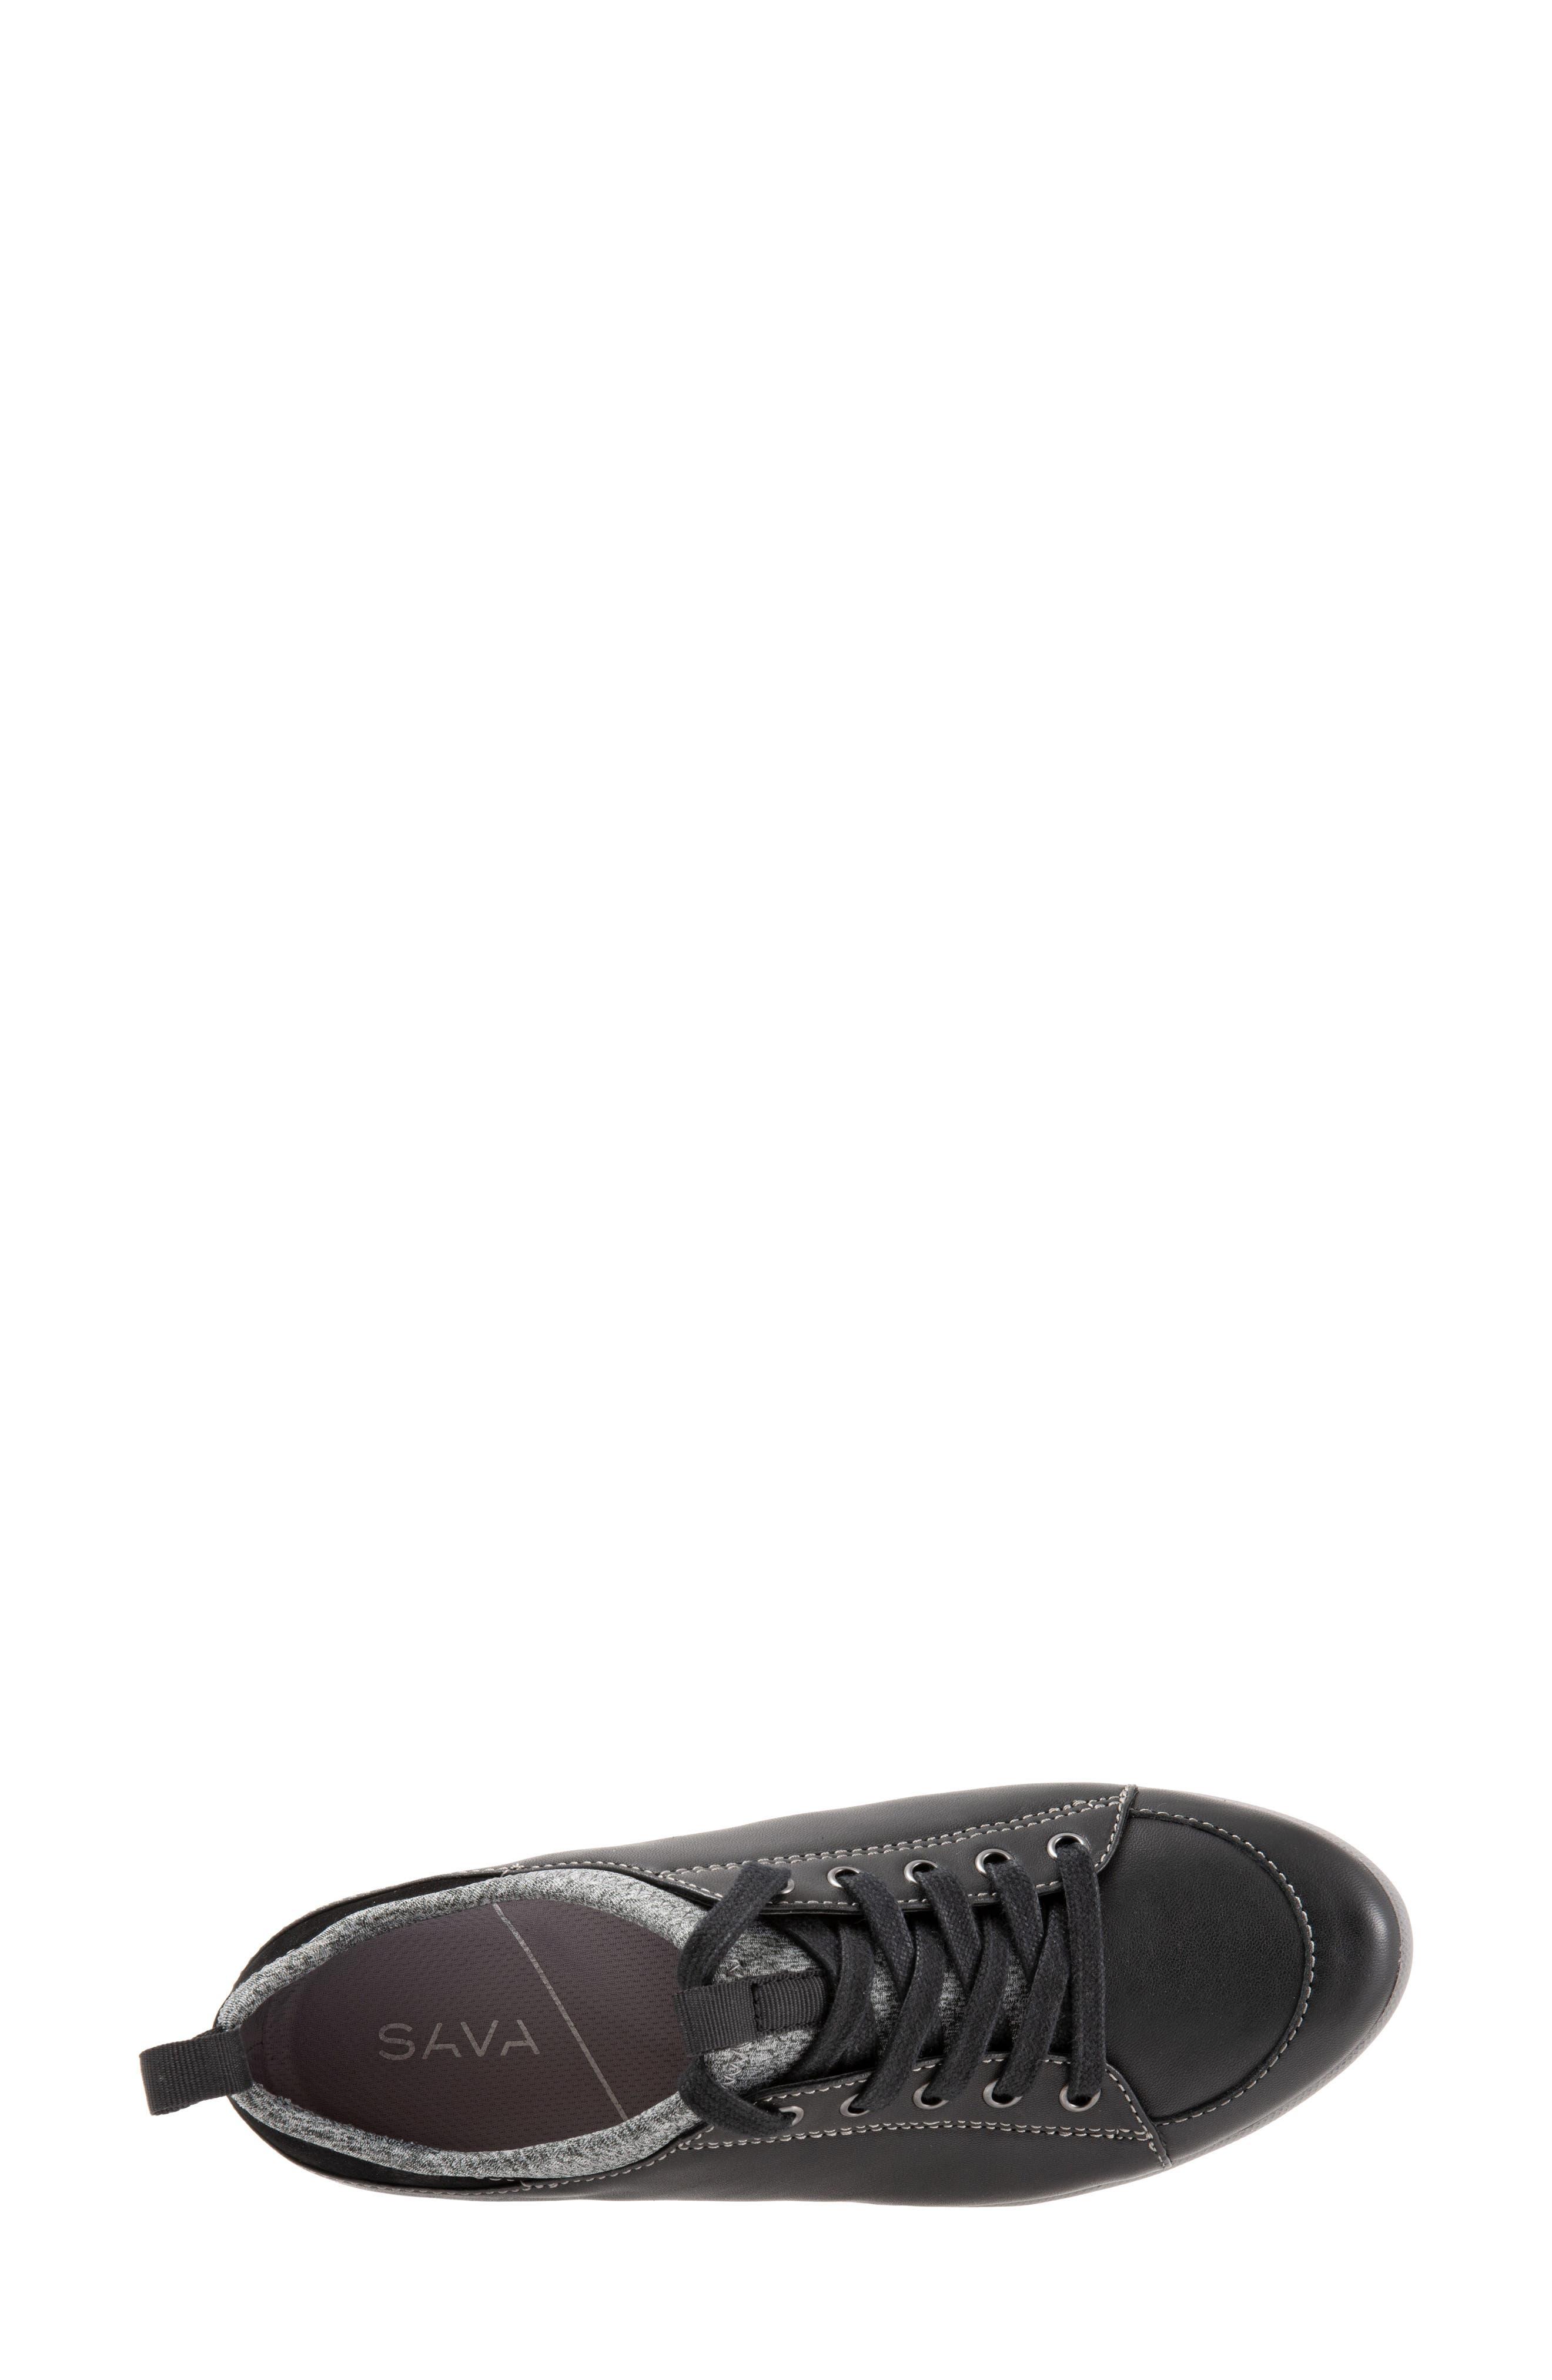 SOFTWALK<SUP>®</SUP>, SAVA Haven Sneaker, Alternate thumbnail 5, color, BLACK/ GREY LEATHER